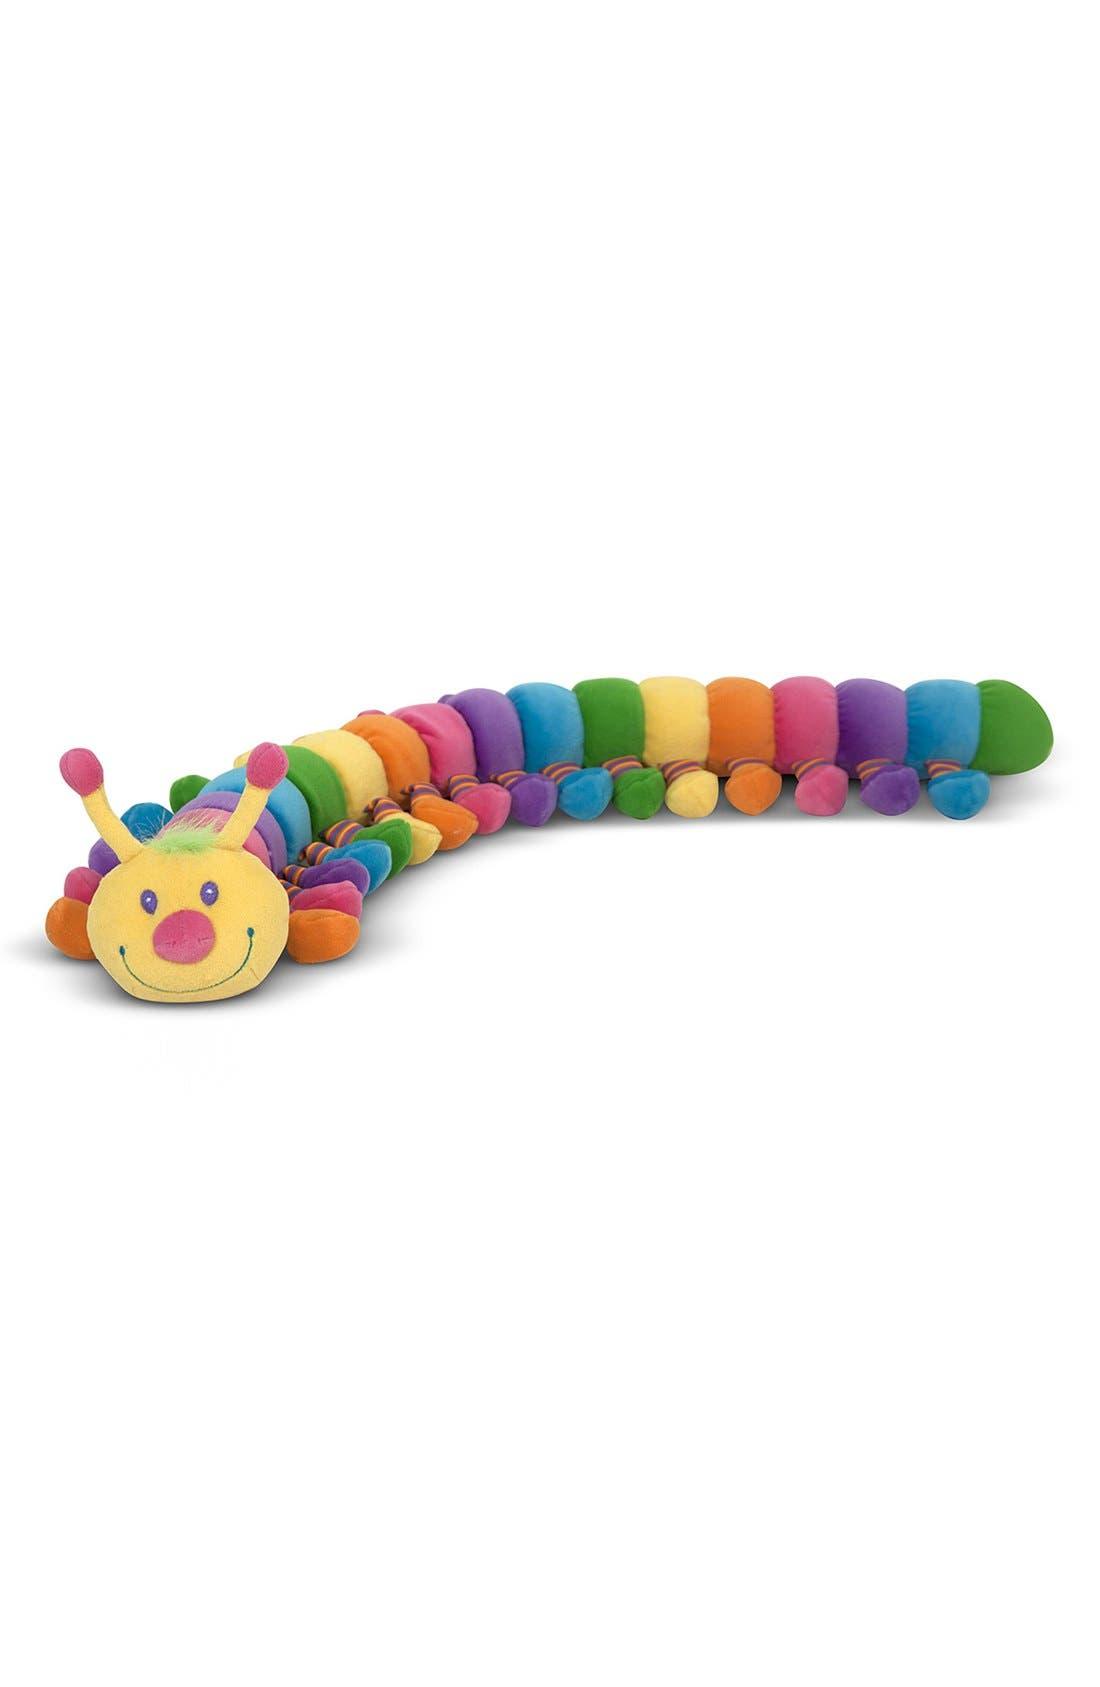 'Longfellow' Plush Caterpillar,                             Alternate thumbnail 3, color,                             Yellow